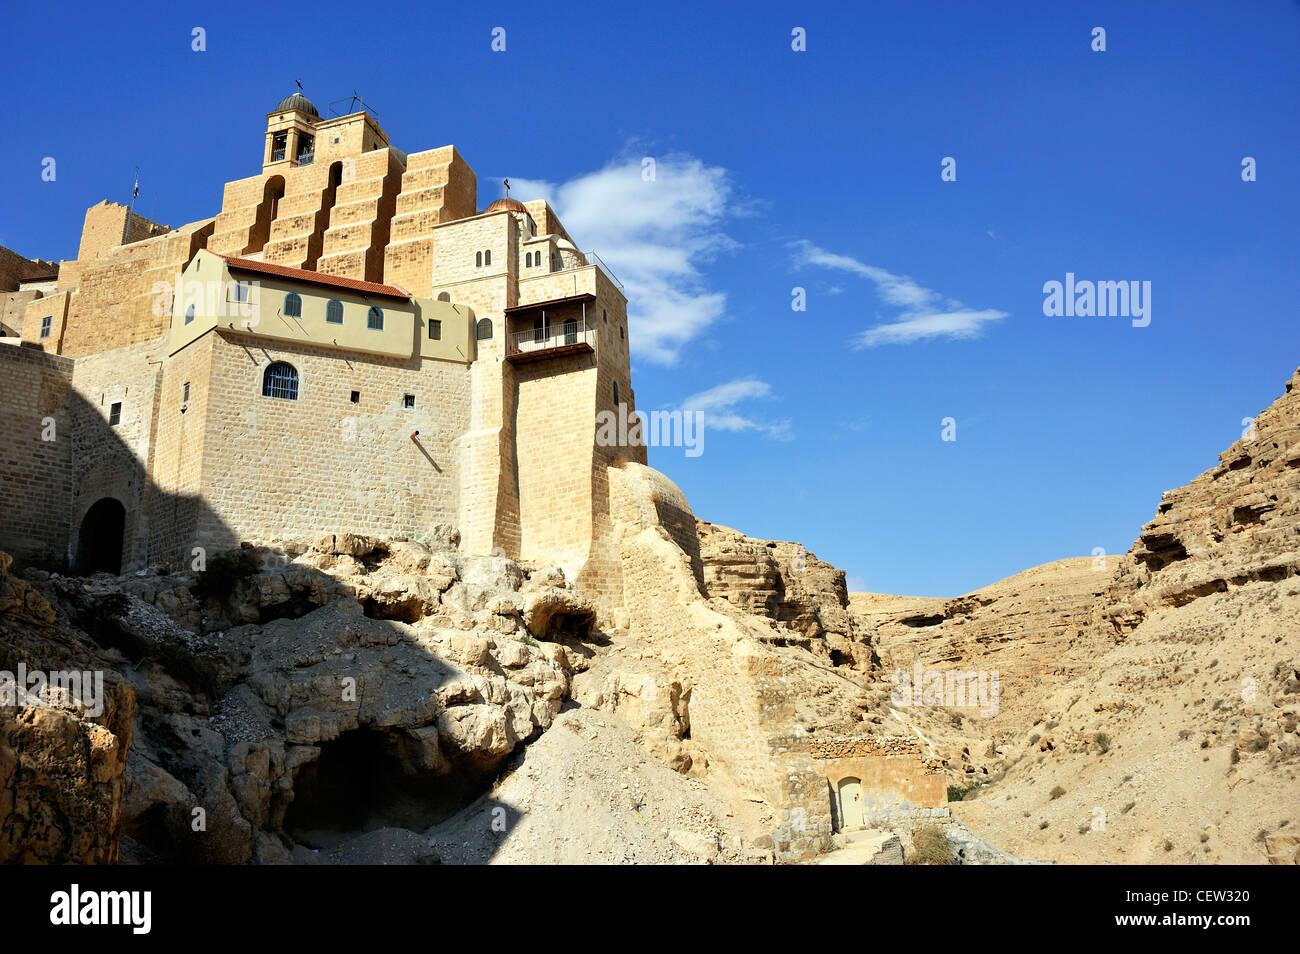 Mar Saba monastery in the Judea desert - Stock Image